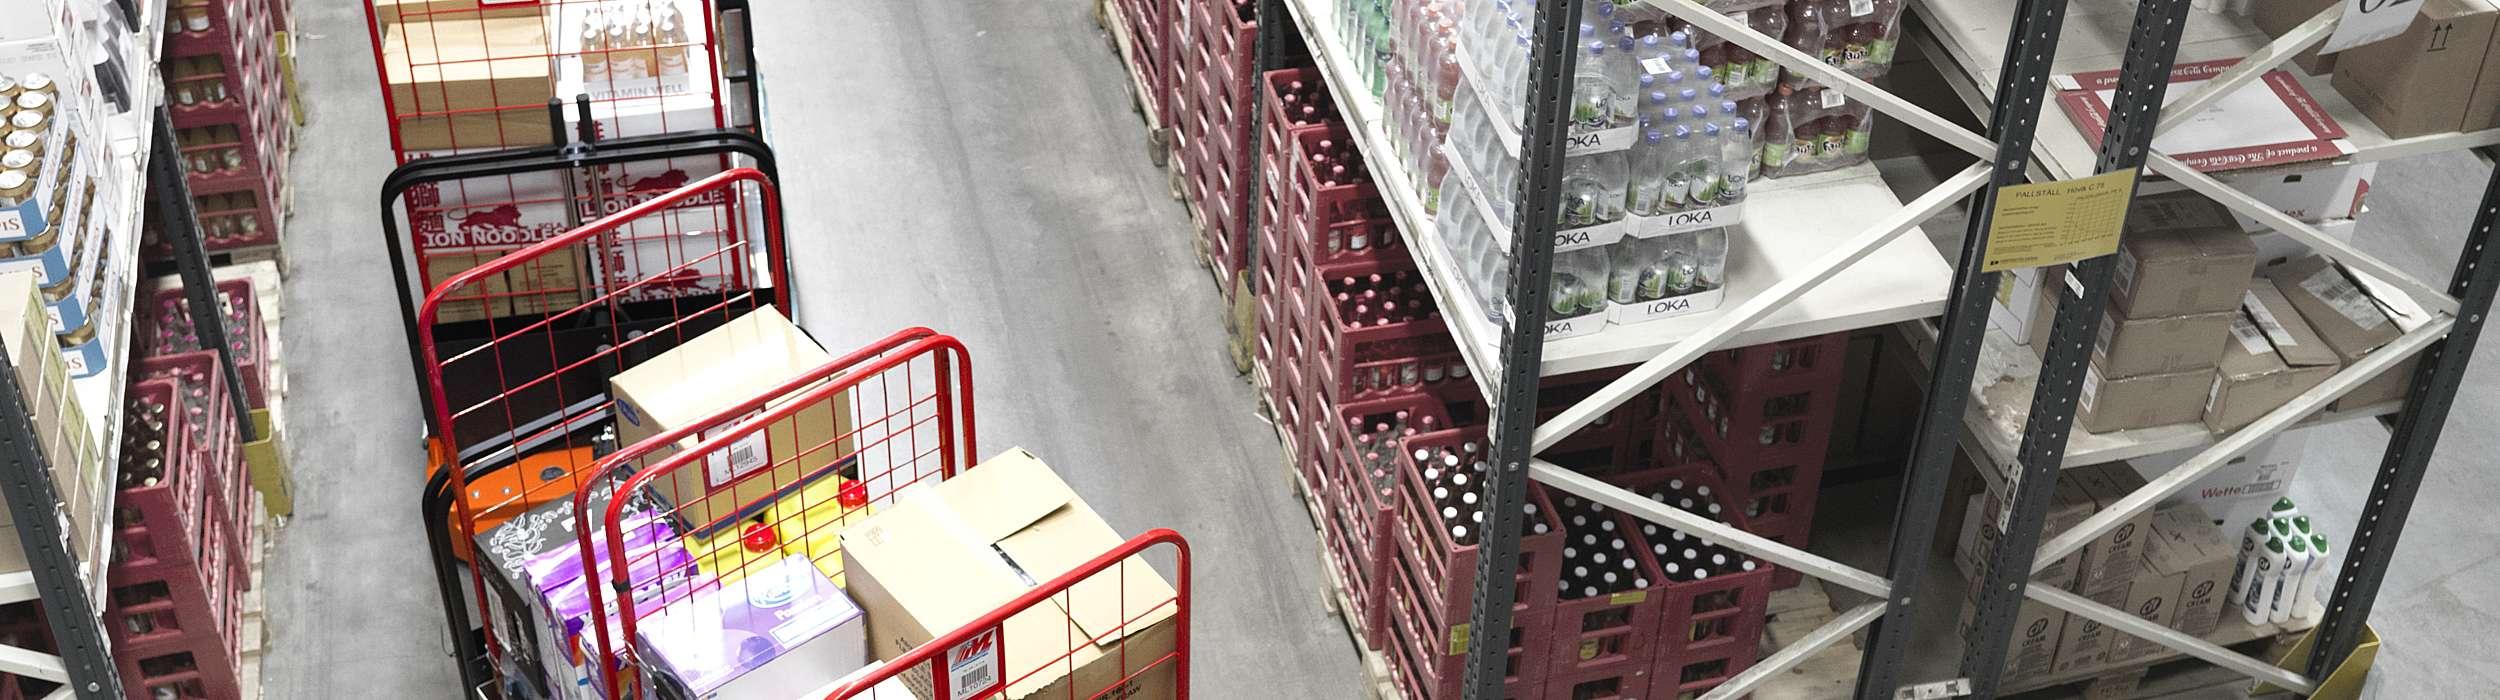 T-motion train in warehouse